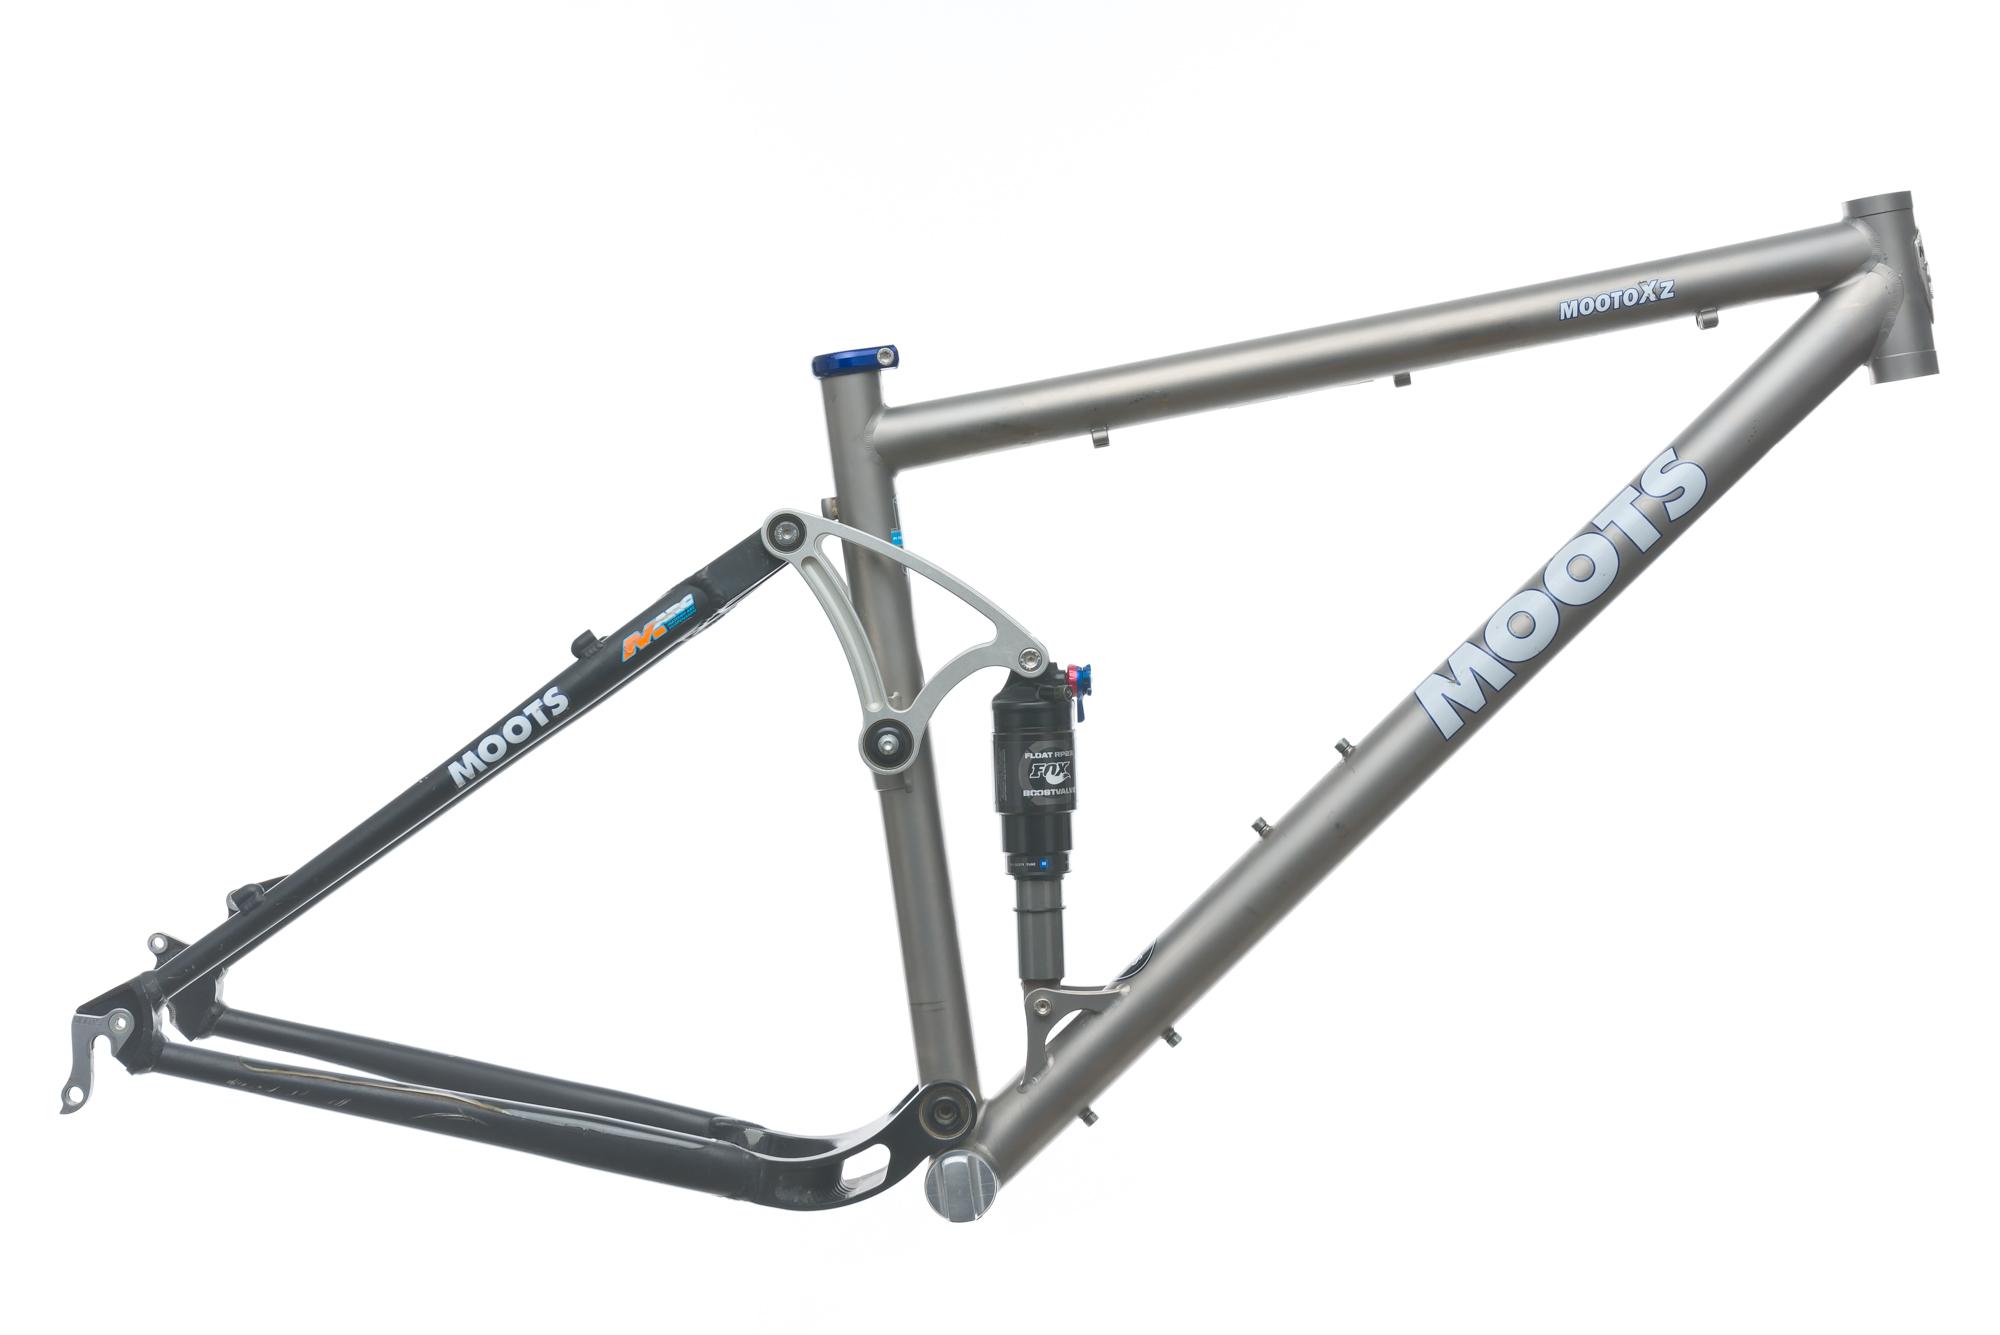 2009 Moots Mooto XZ Mountain Bike Frame 18in Medium 29\